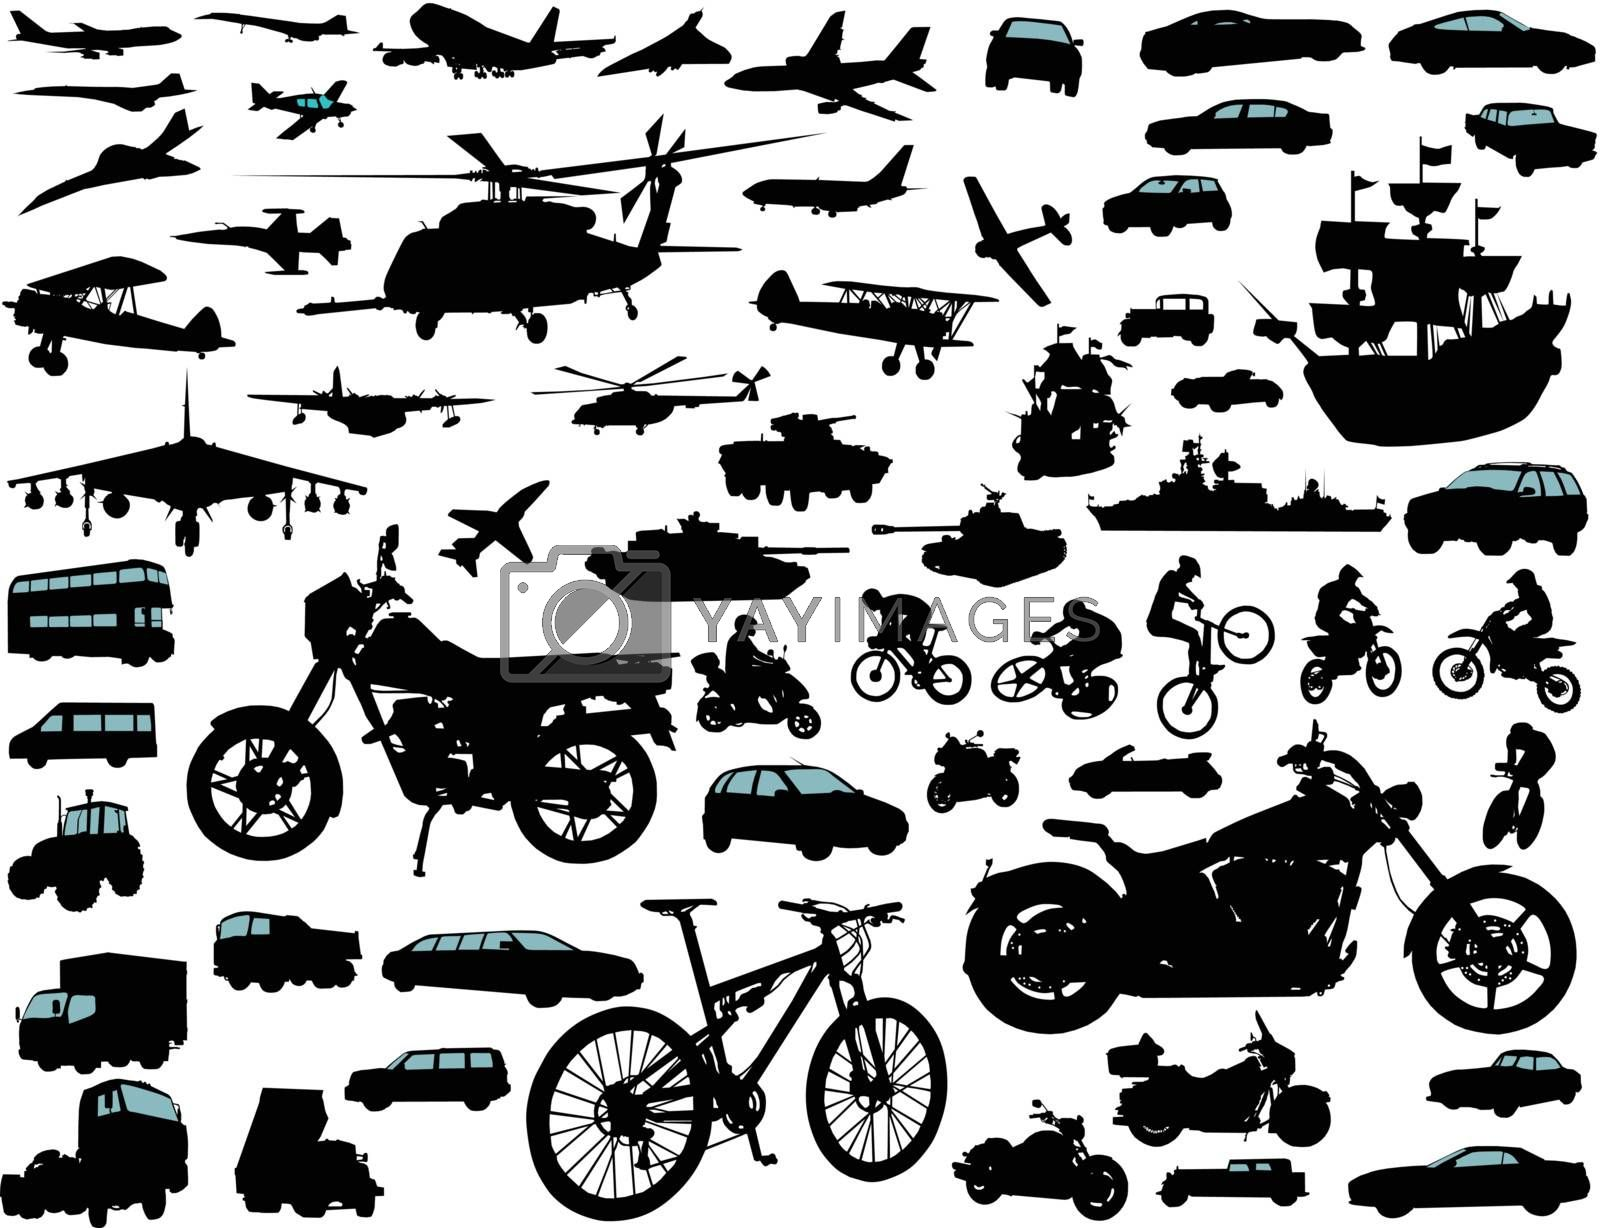 Set of transportation silhouettes: cars, planes, bikes, ships